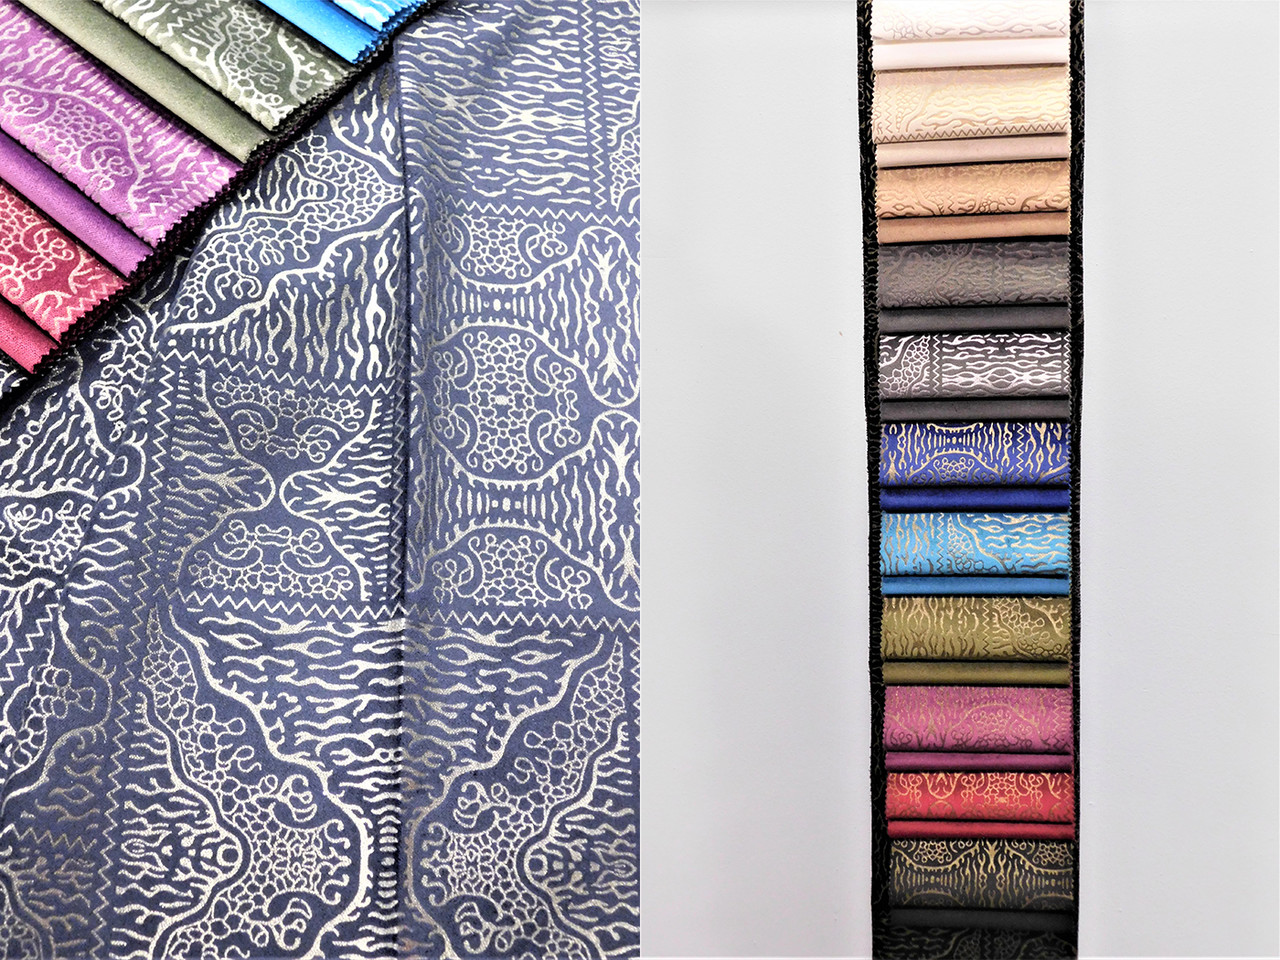 Fasil/Ottoman портьерная ткань с рисунком (ширина 140 см)